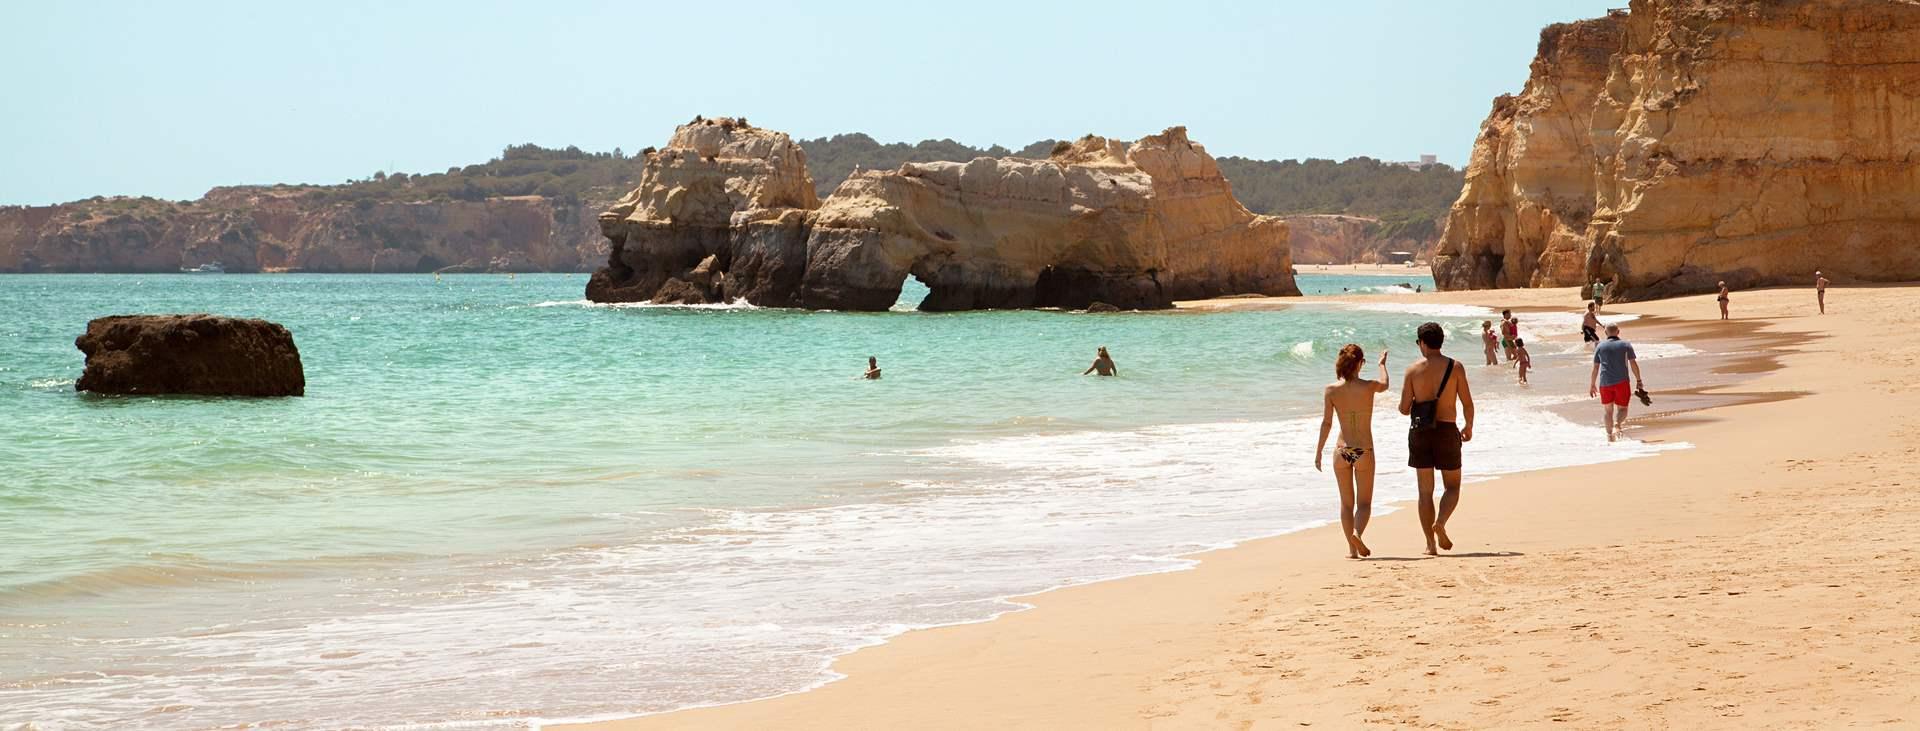 Resor till Praia da Rocha i Portugal